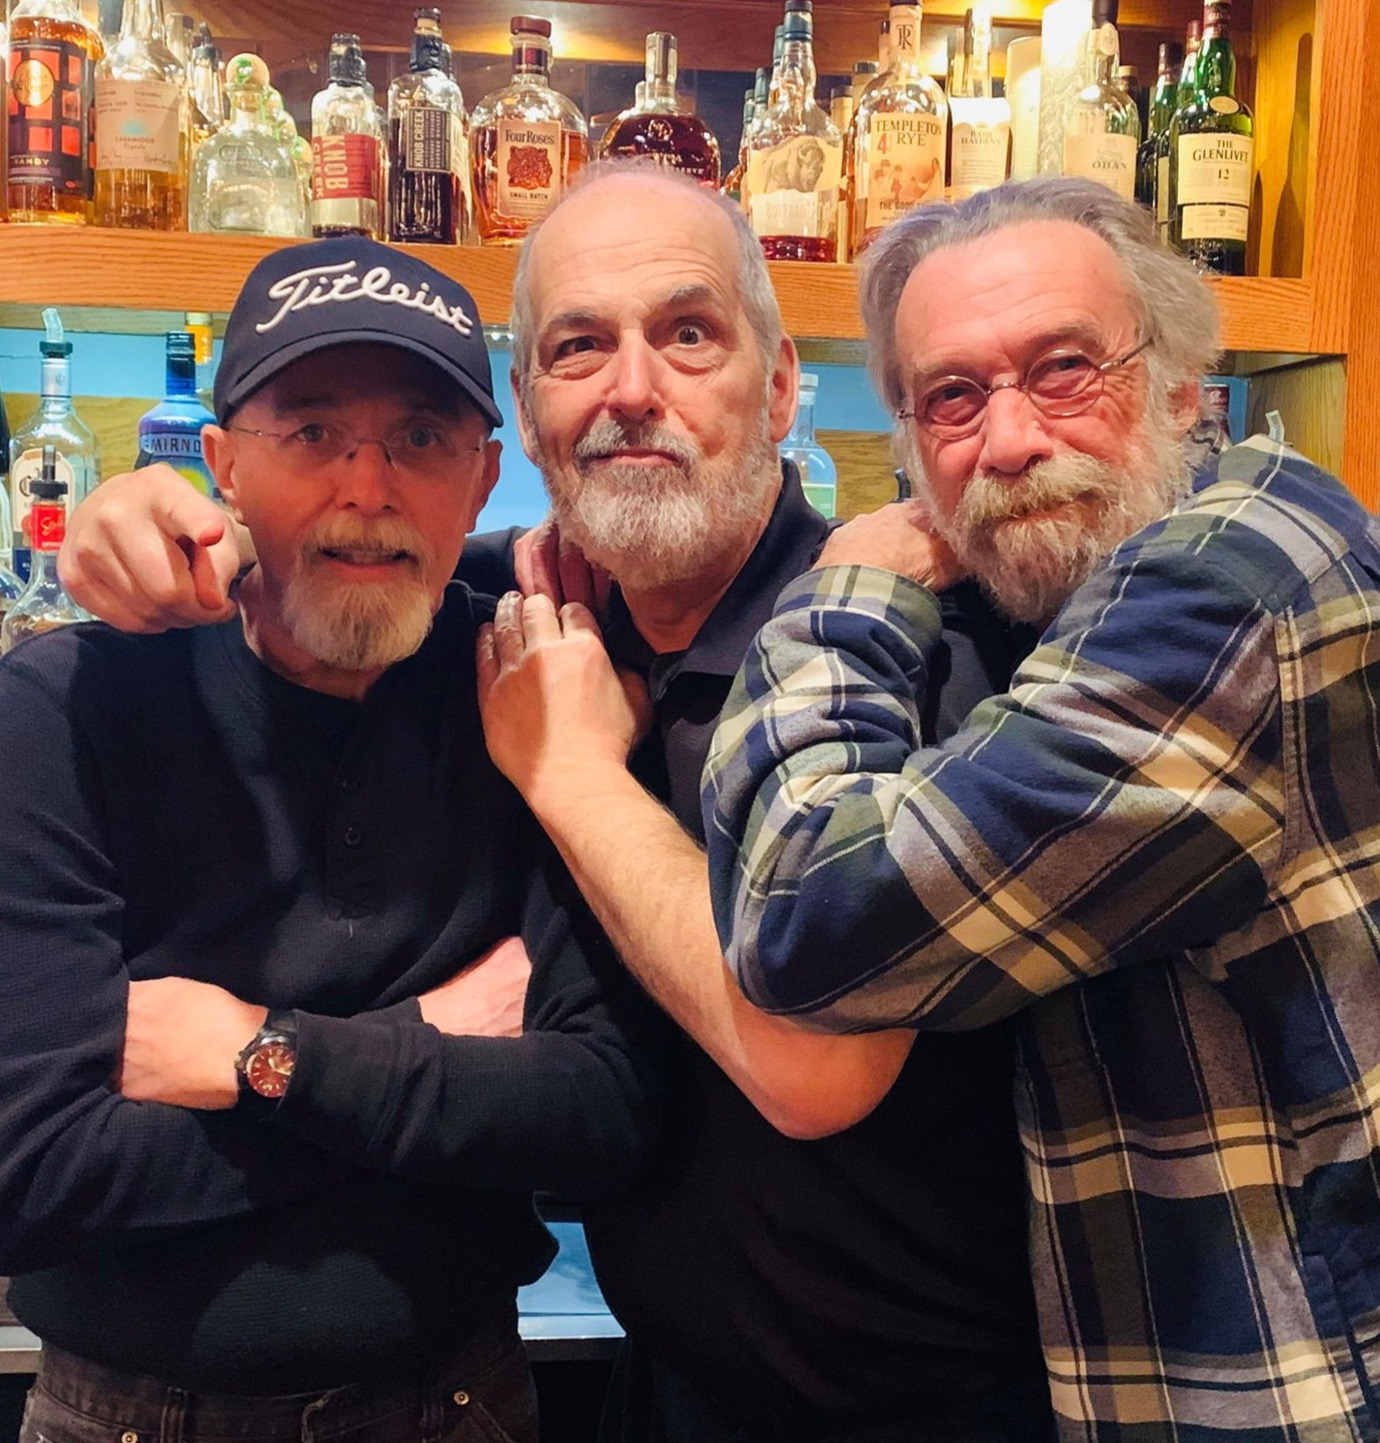 Three Old Geezers